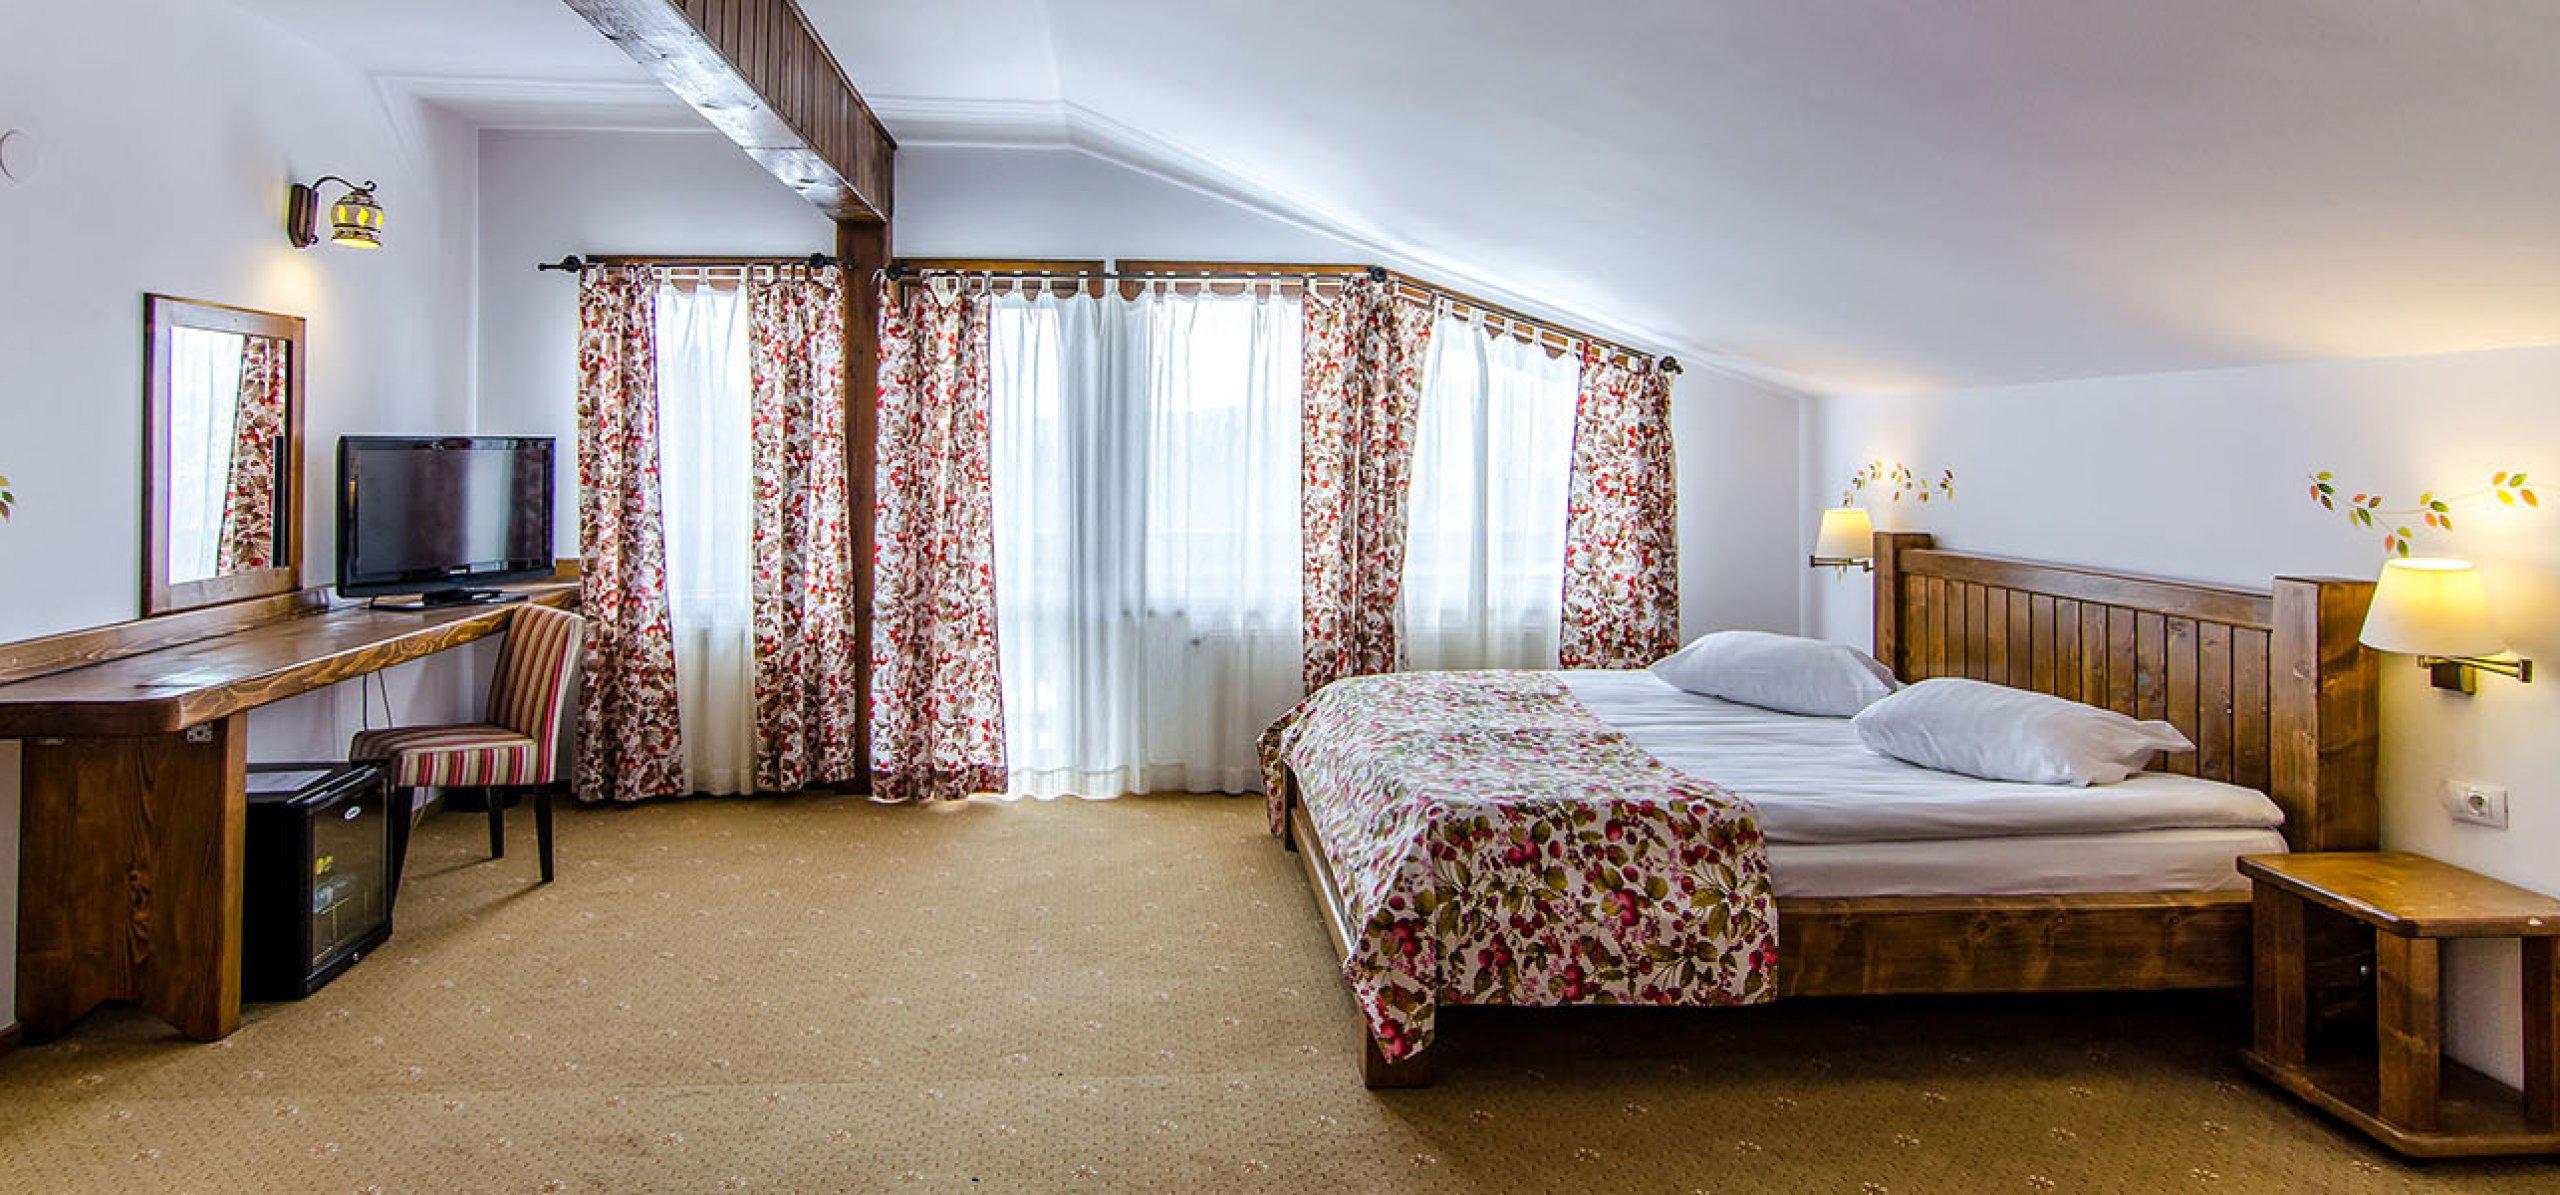 suita-1-camera-spatioasa-hotel-bucegi